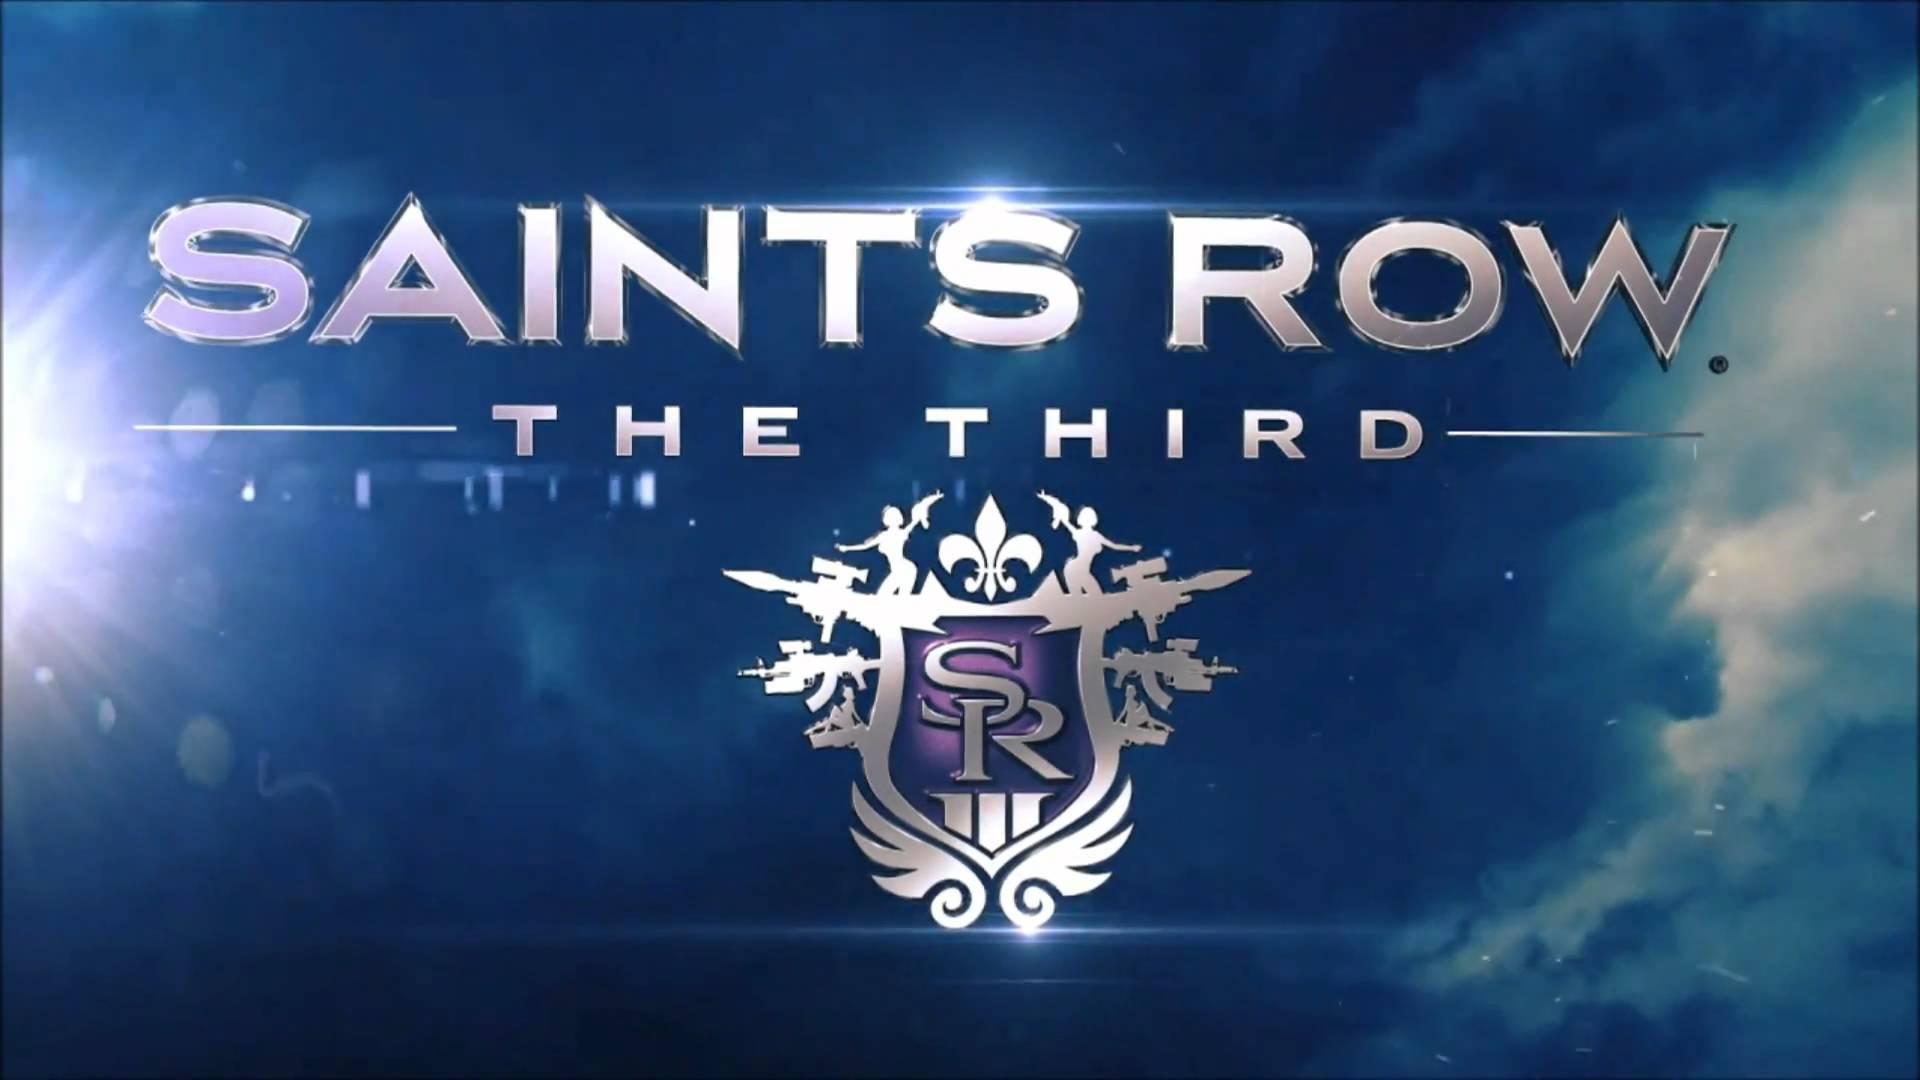 The Third Hd Wallpaper Hd Saints Row The Third Hd